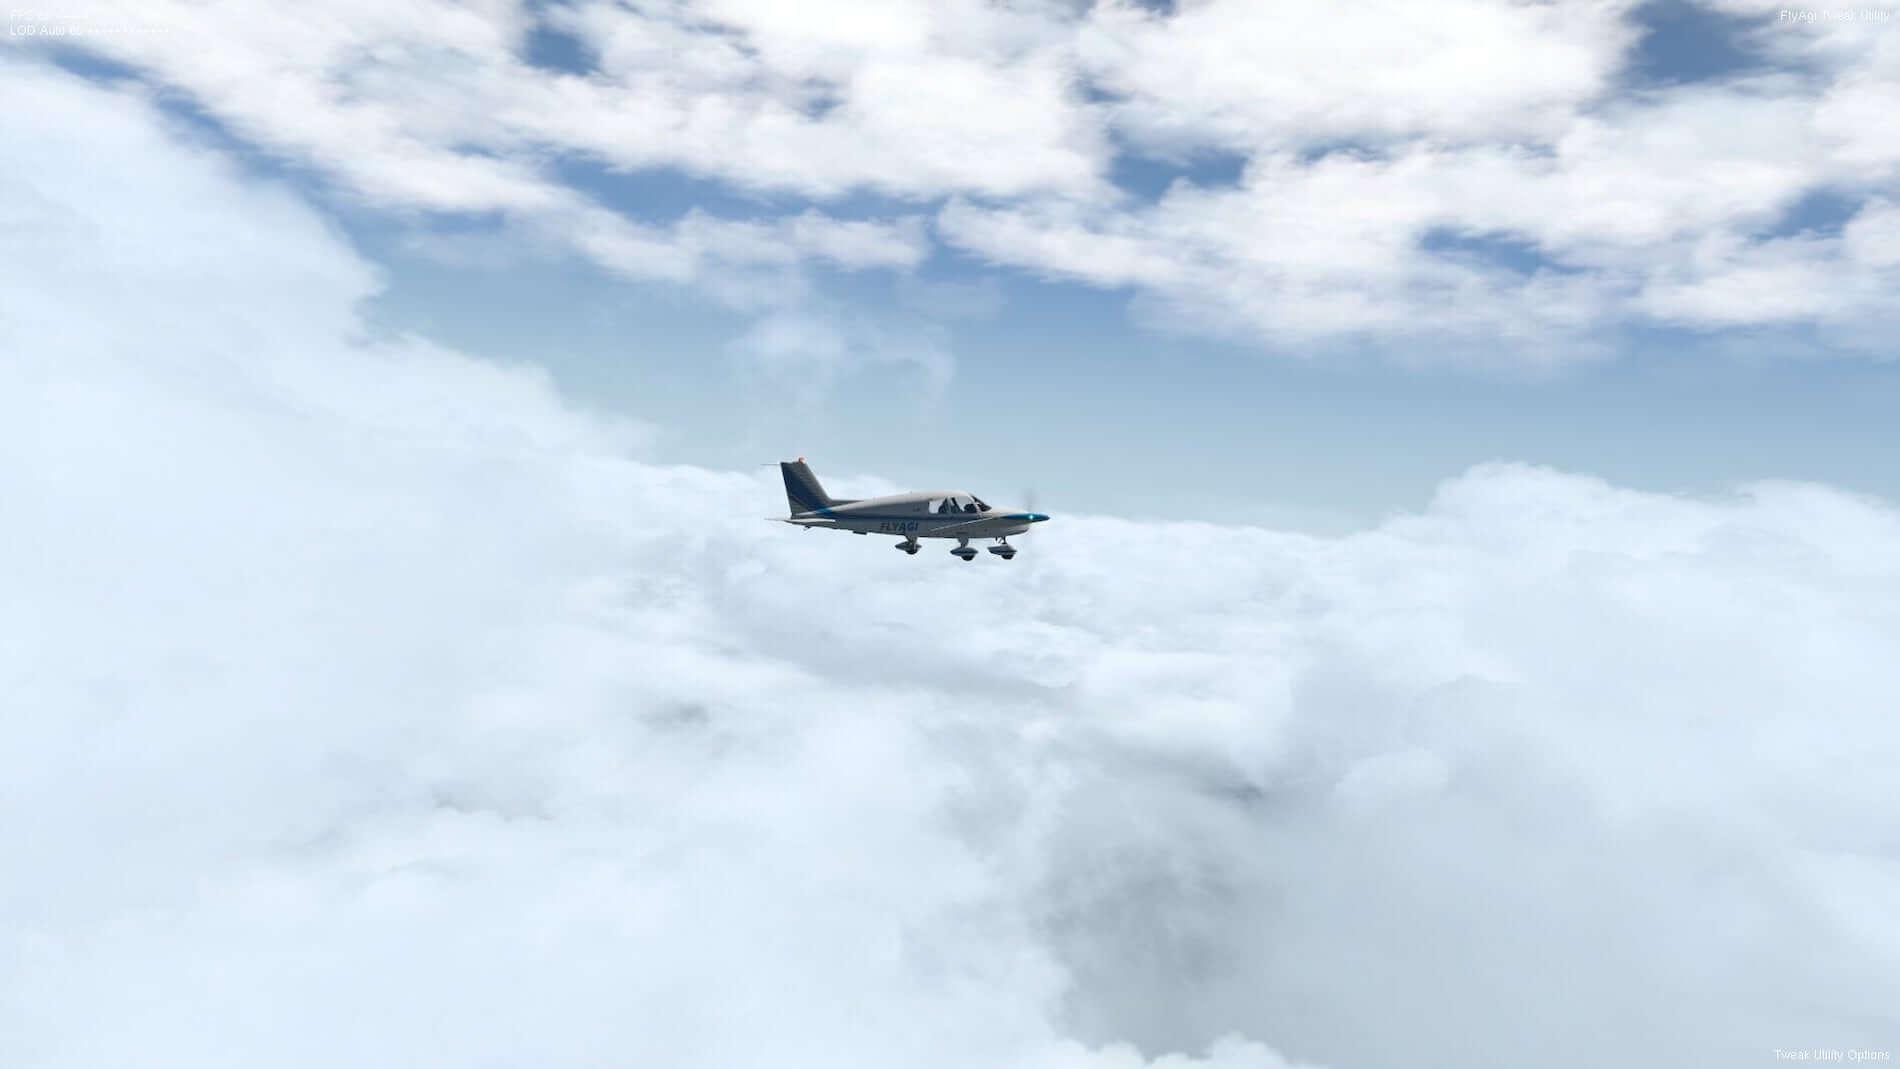 FlyAGI-FTU-Weather-System-ASXP-13